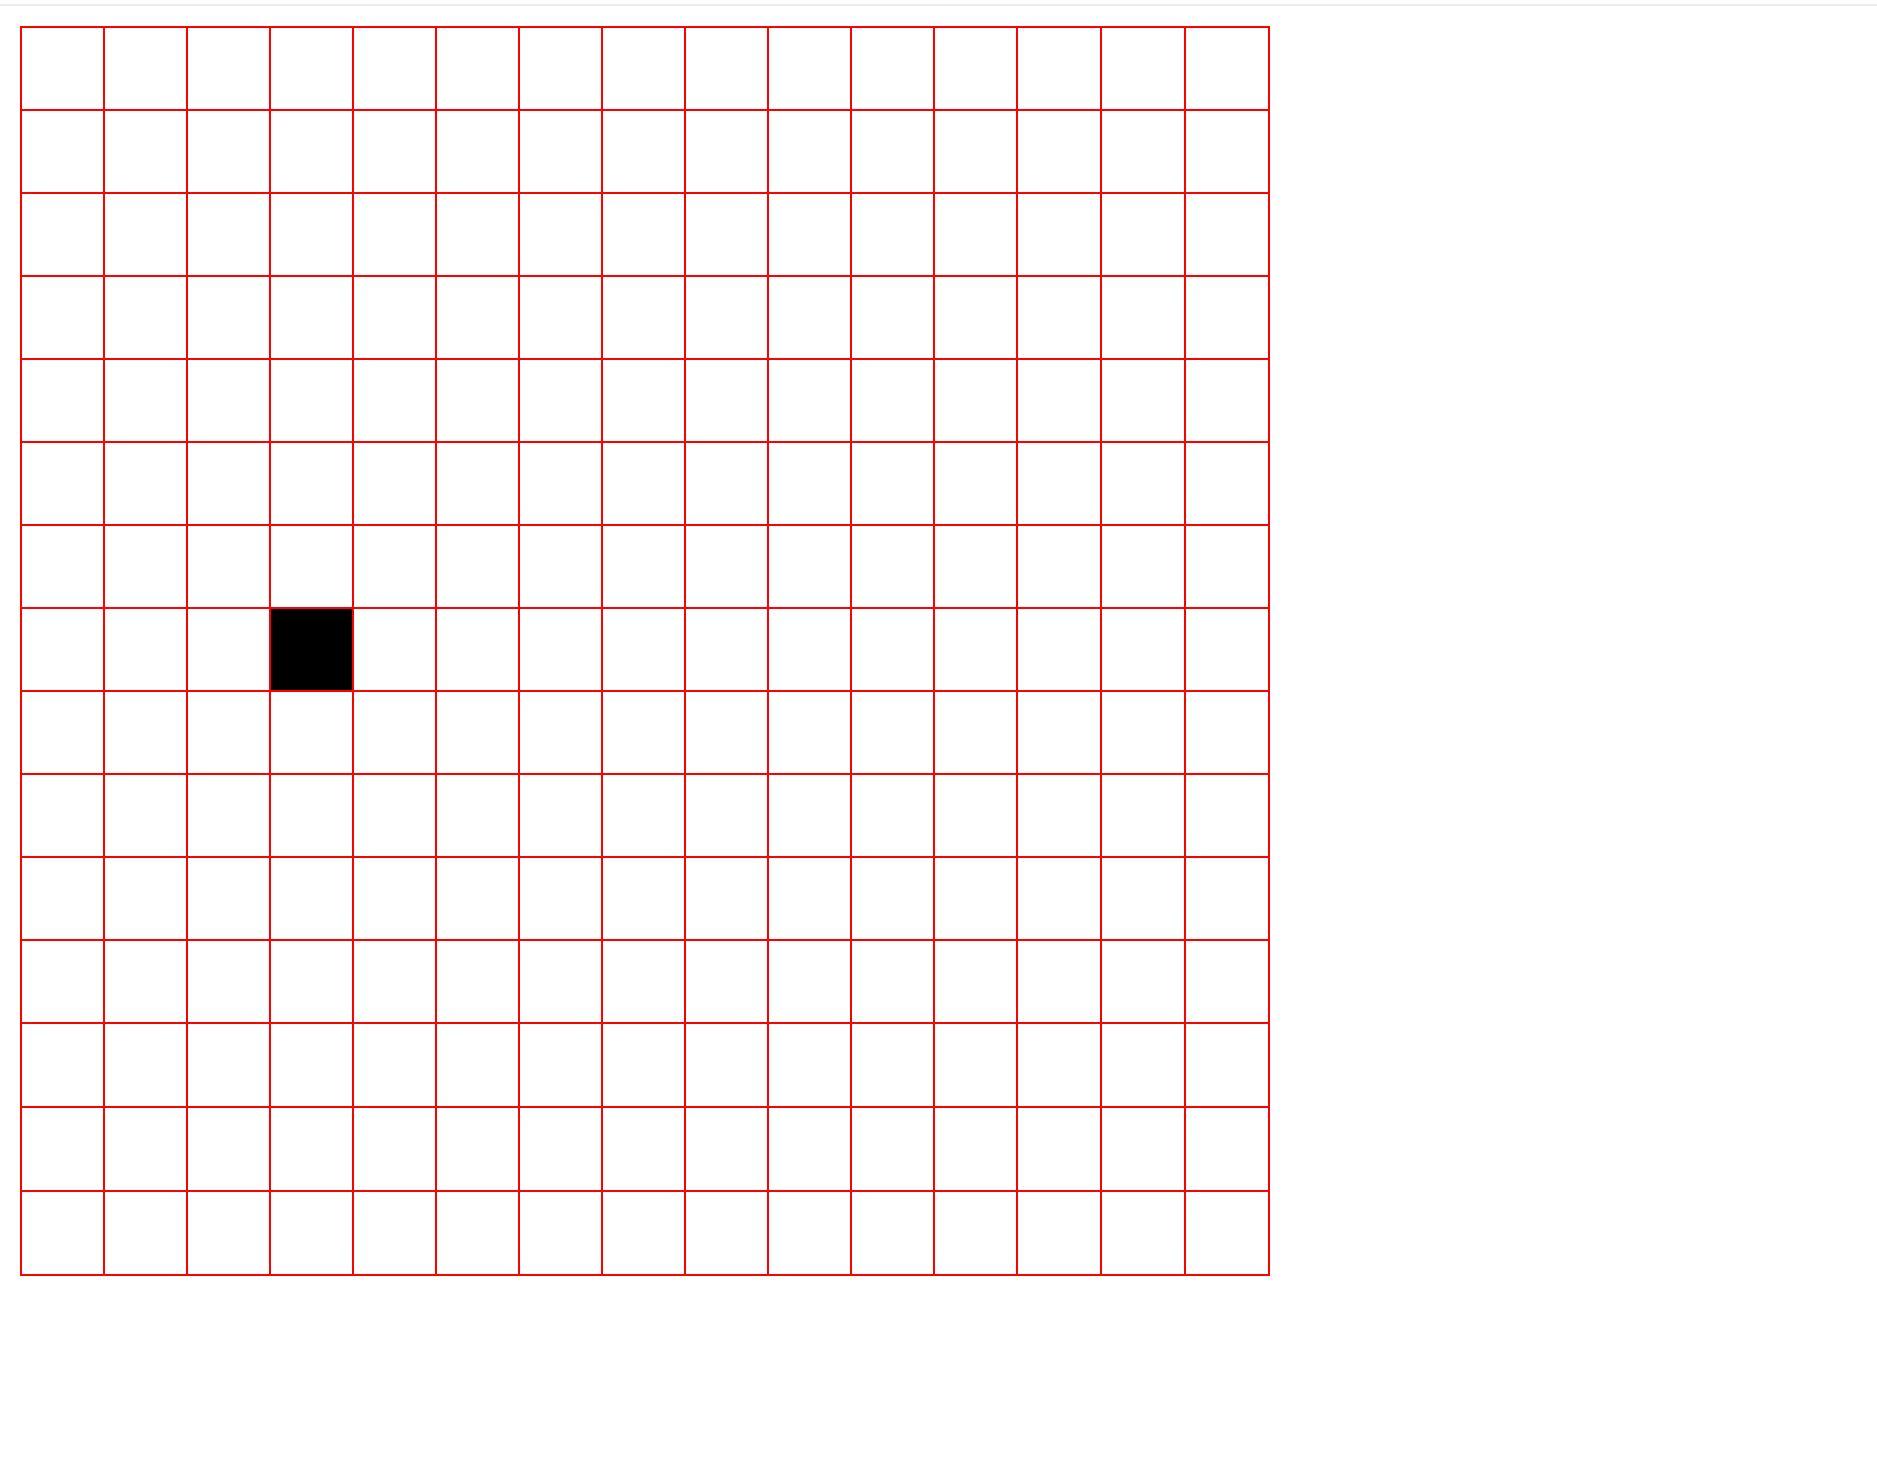 JQuery实现键盘移动键操作黑块移动 jQuery教程 第2张